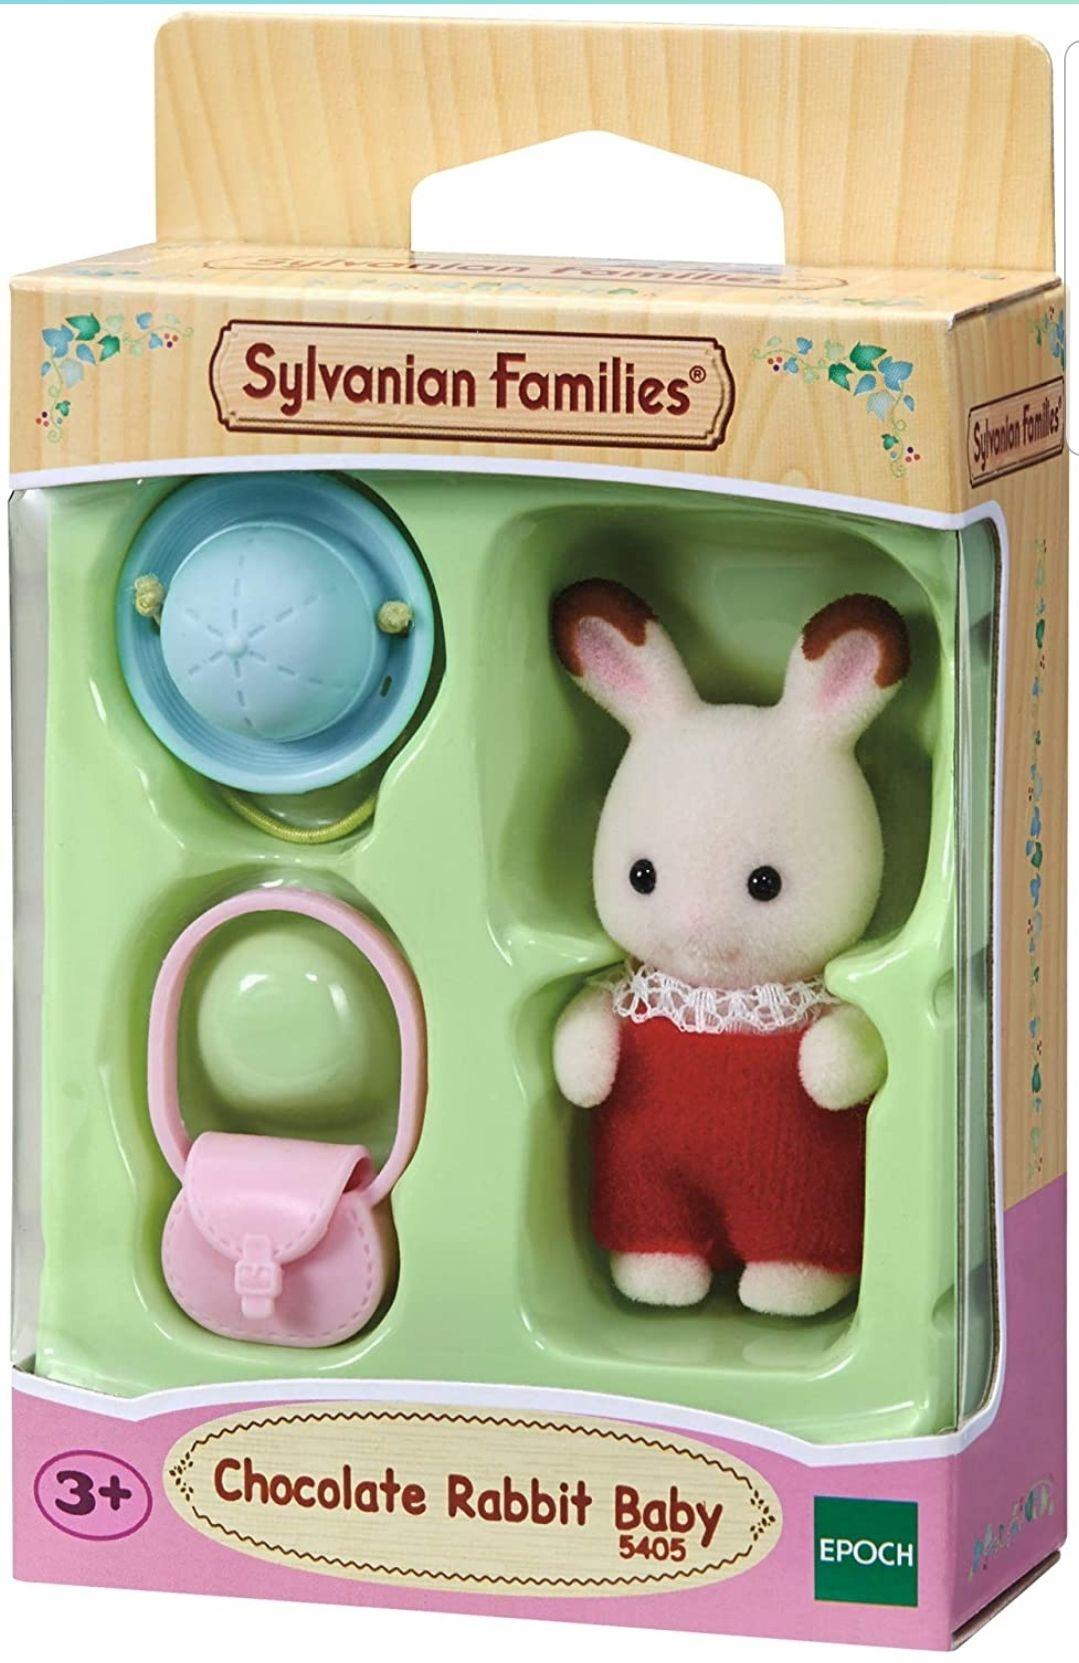 Sylvanian Families 5405 Chocolate Rabbit Baby Figurine @ Amazon